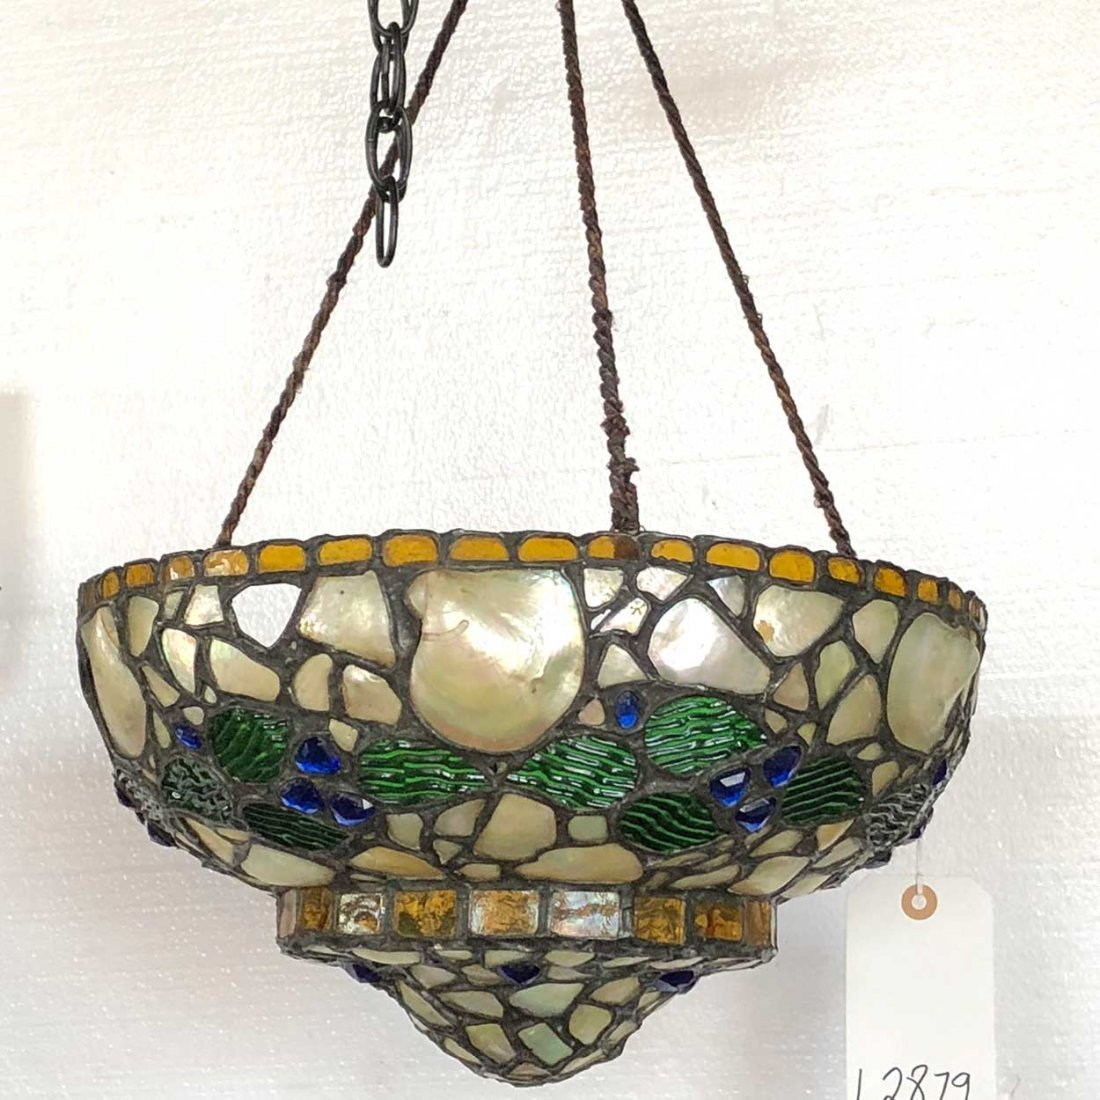 Swedish Glass Mosaic Bowl Pendant Hanging Light Fixture - 5